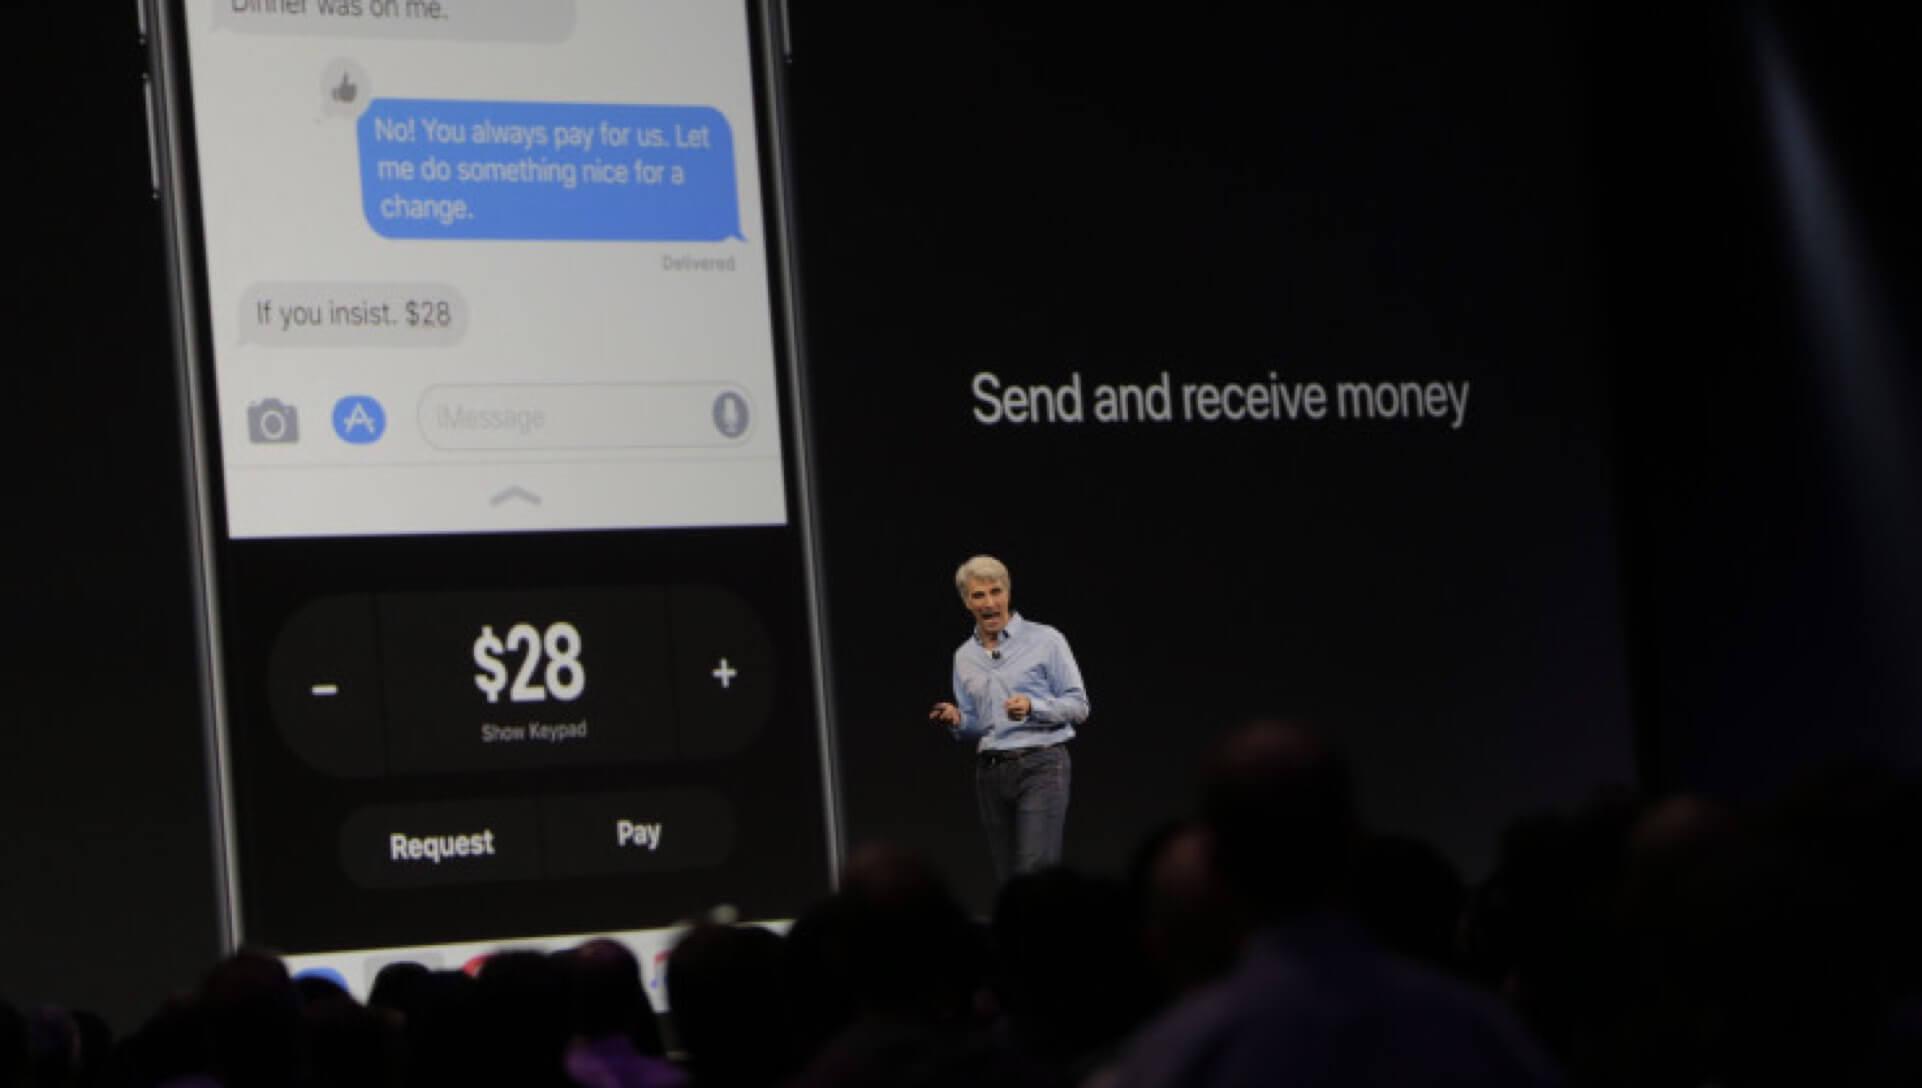 Apple Pay P2P penzkuldes